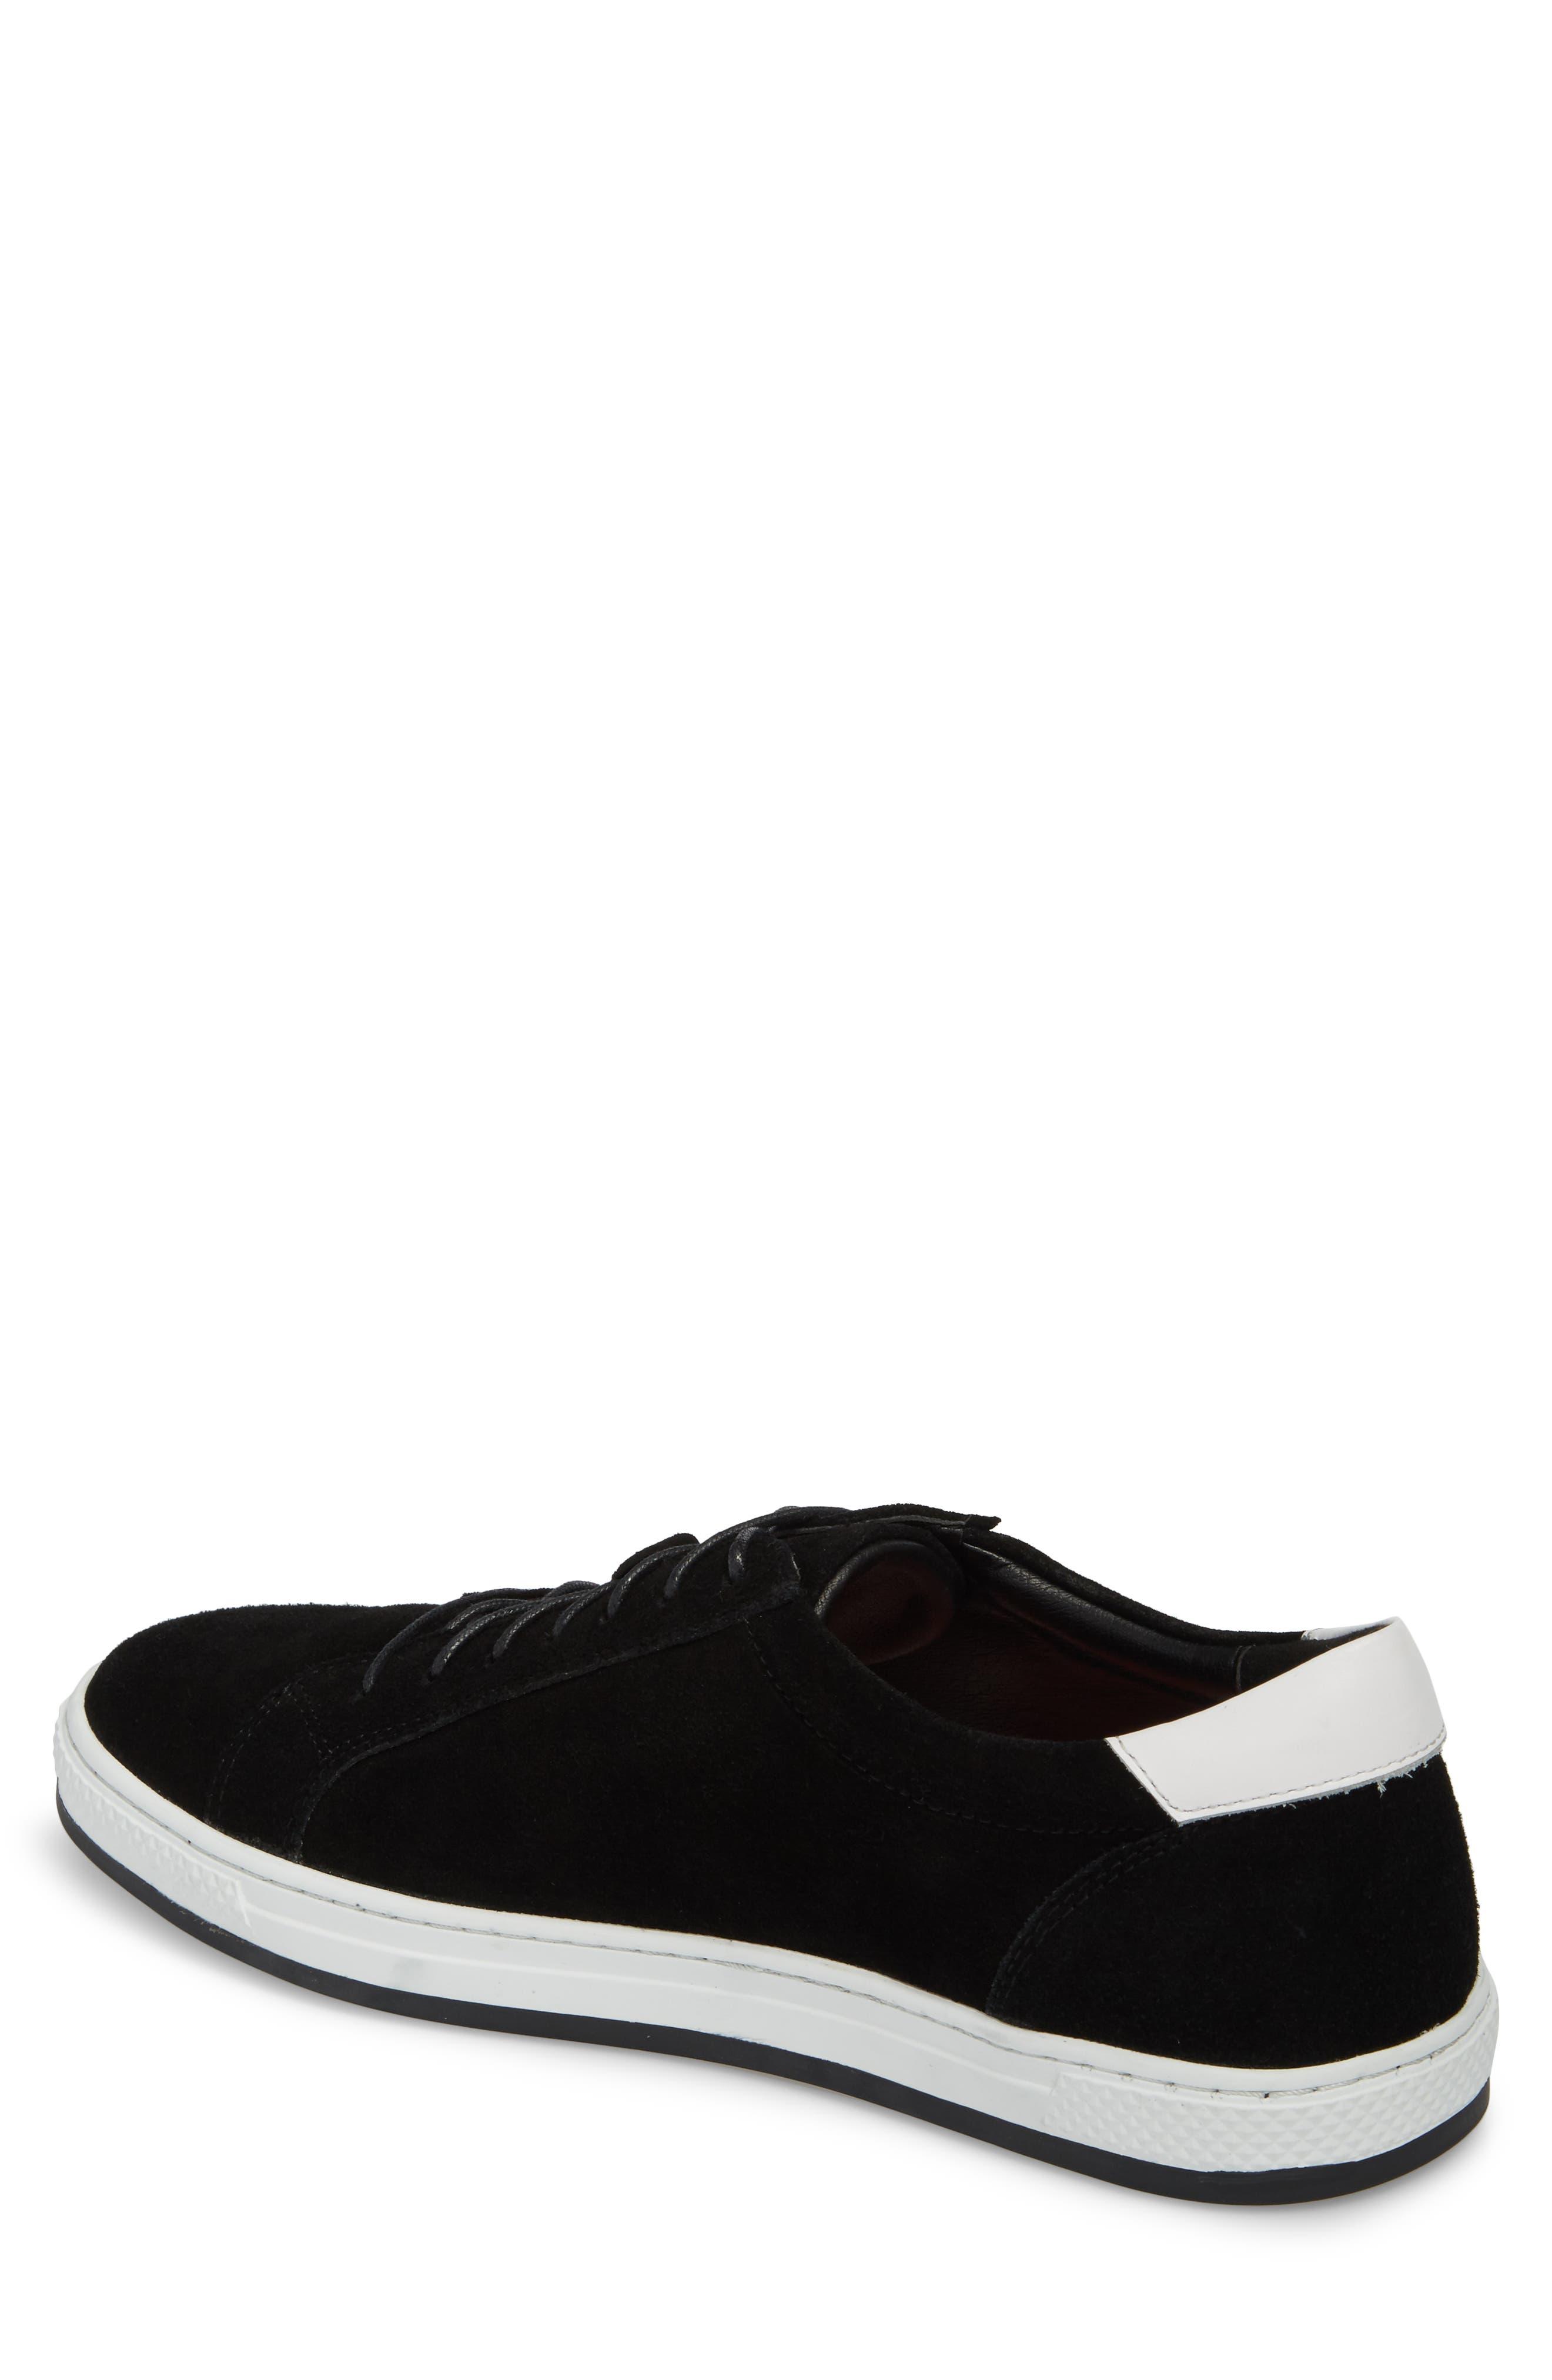 Queens Sneaker,                             Alternate thumbnail 2, color,                             Black Suede